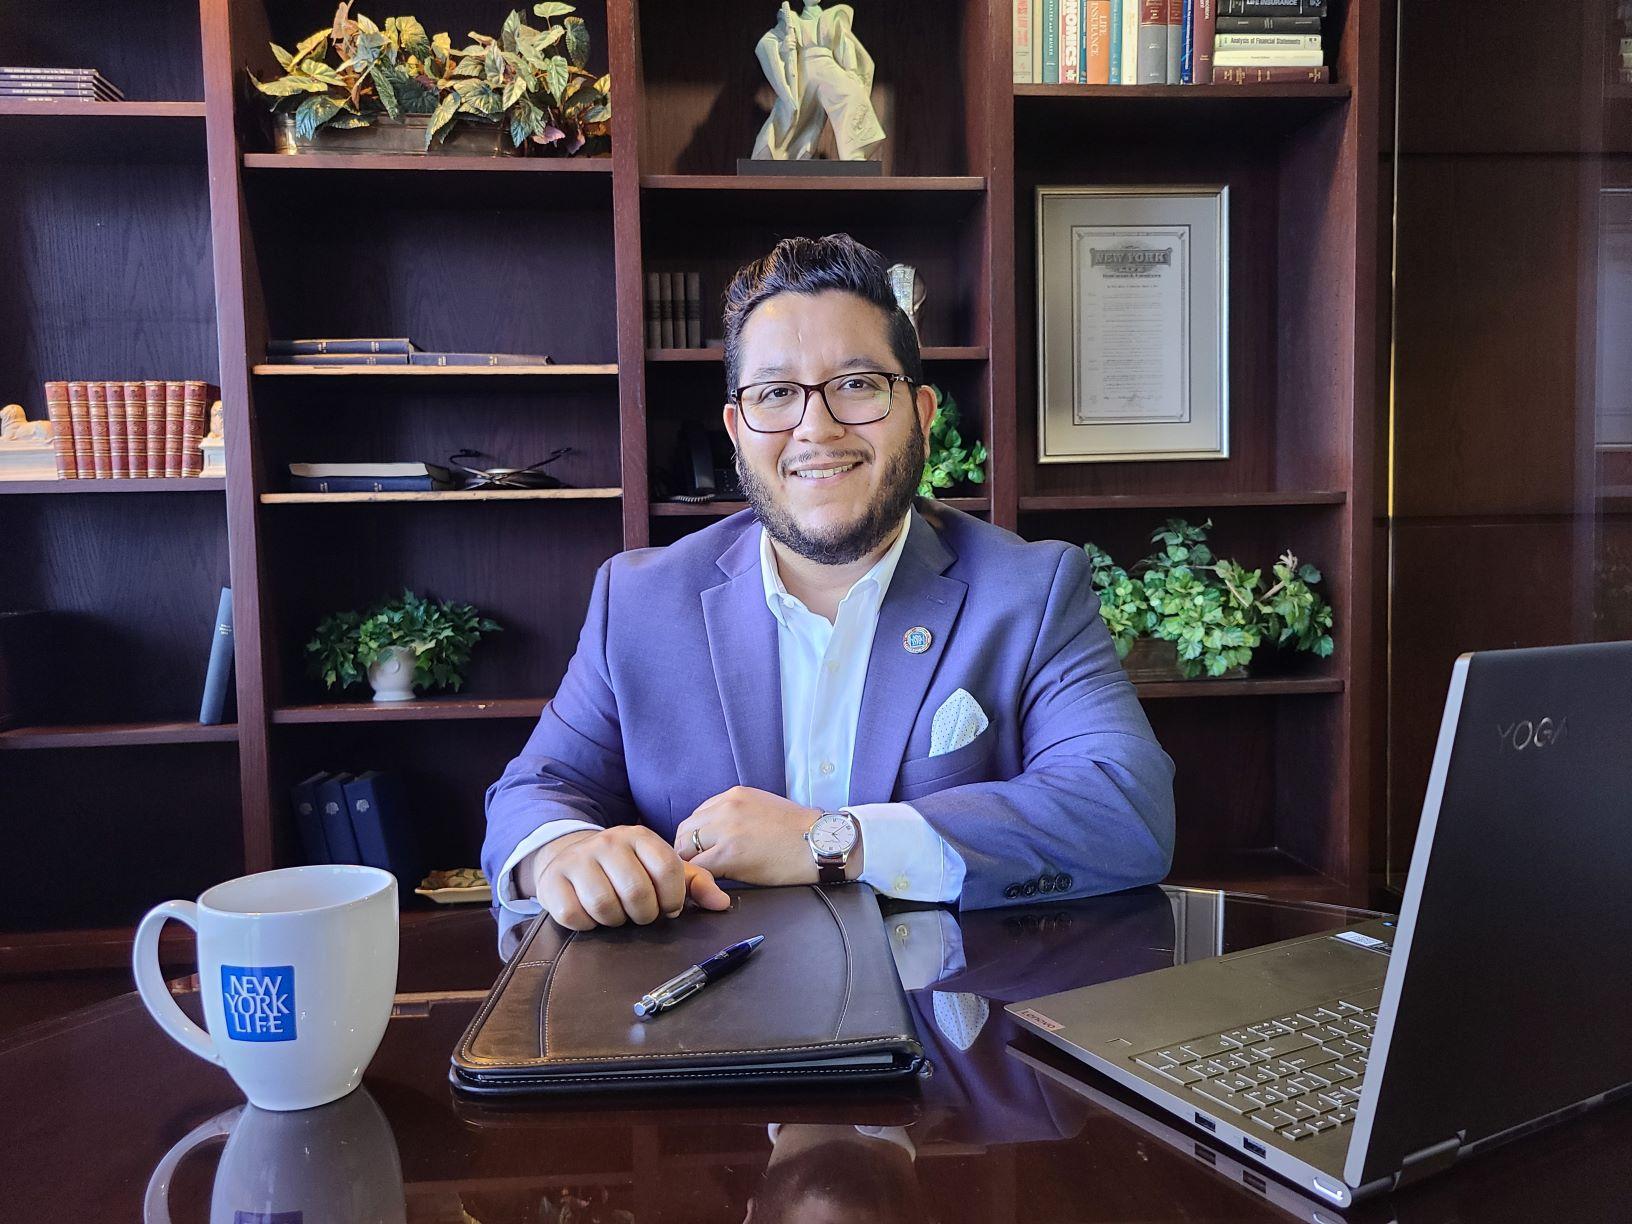 JOEL ALEXANDRO GOMEZ JIMENEZ  Your Registered Representative & Insurance Agent